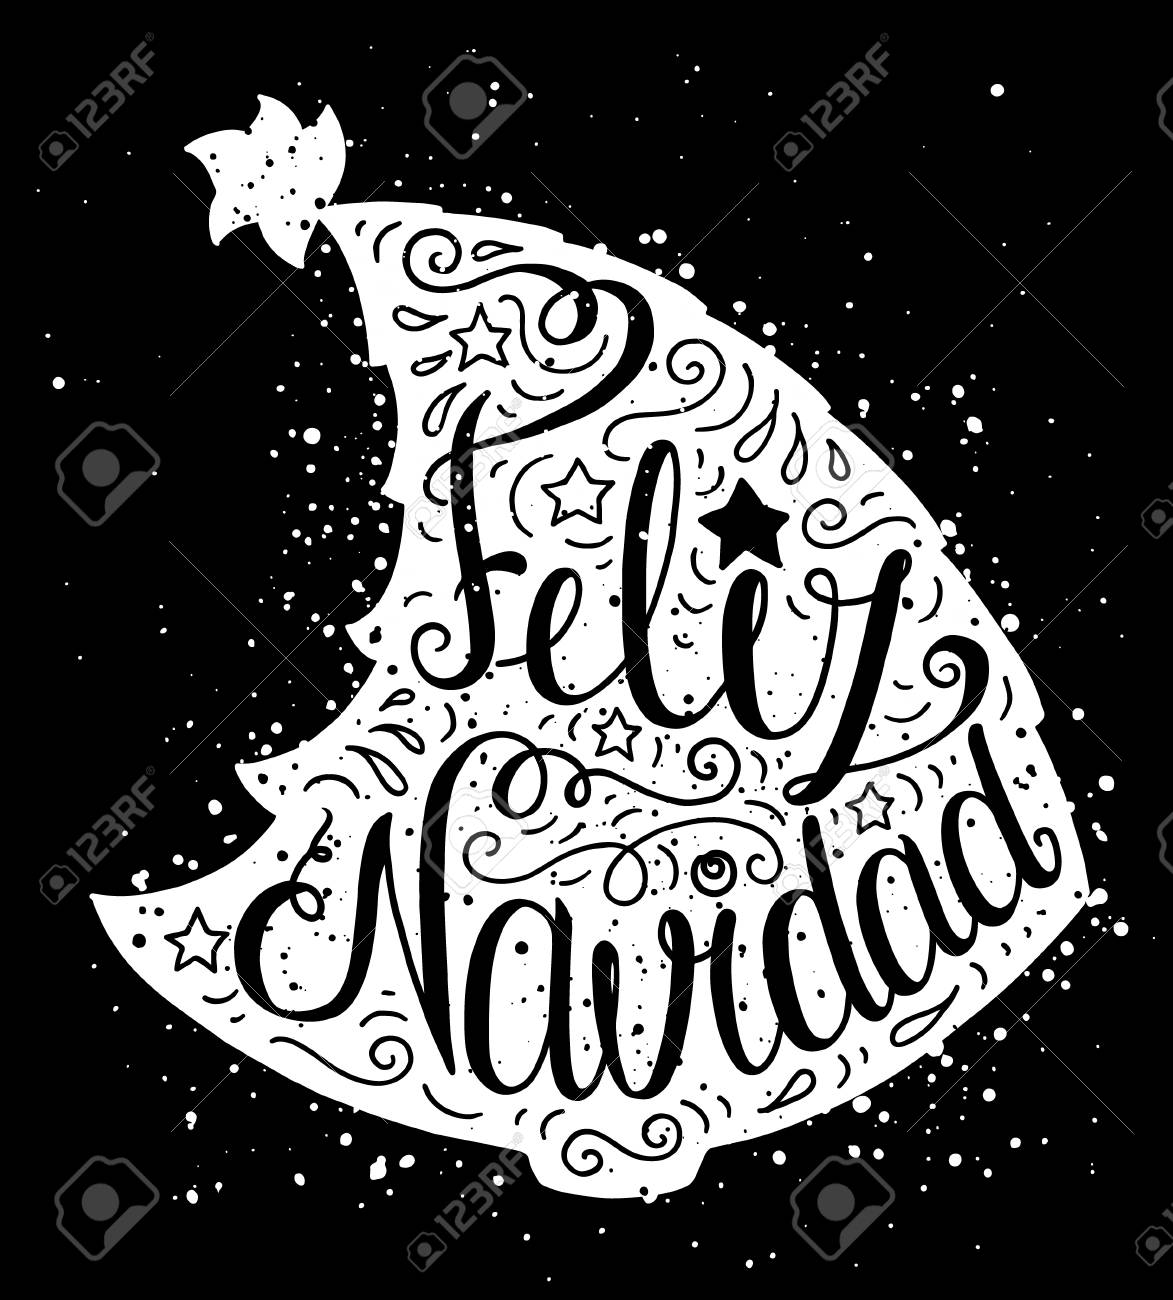 Cartaz De Tipografia Doodle Preto E Branco Com Arvore De Natal